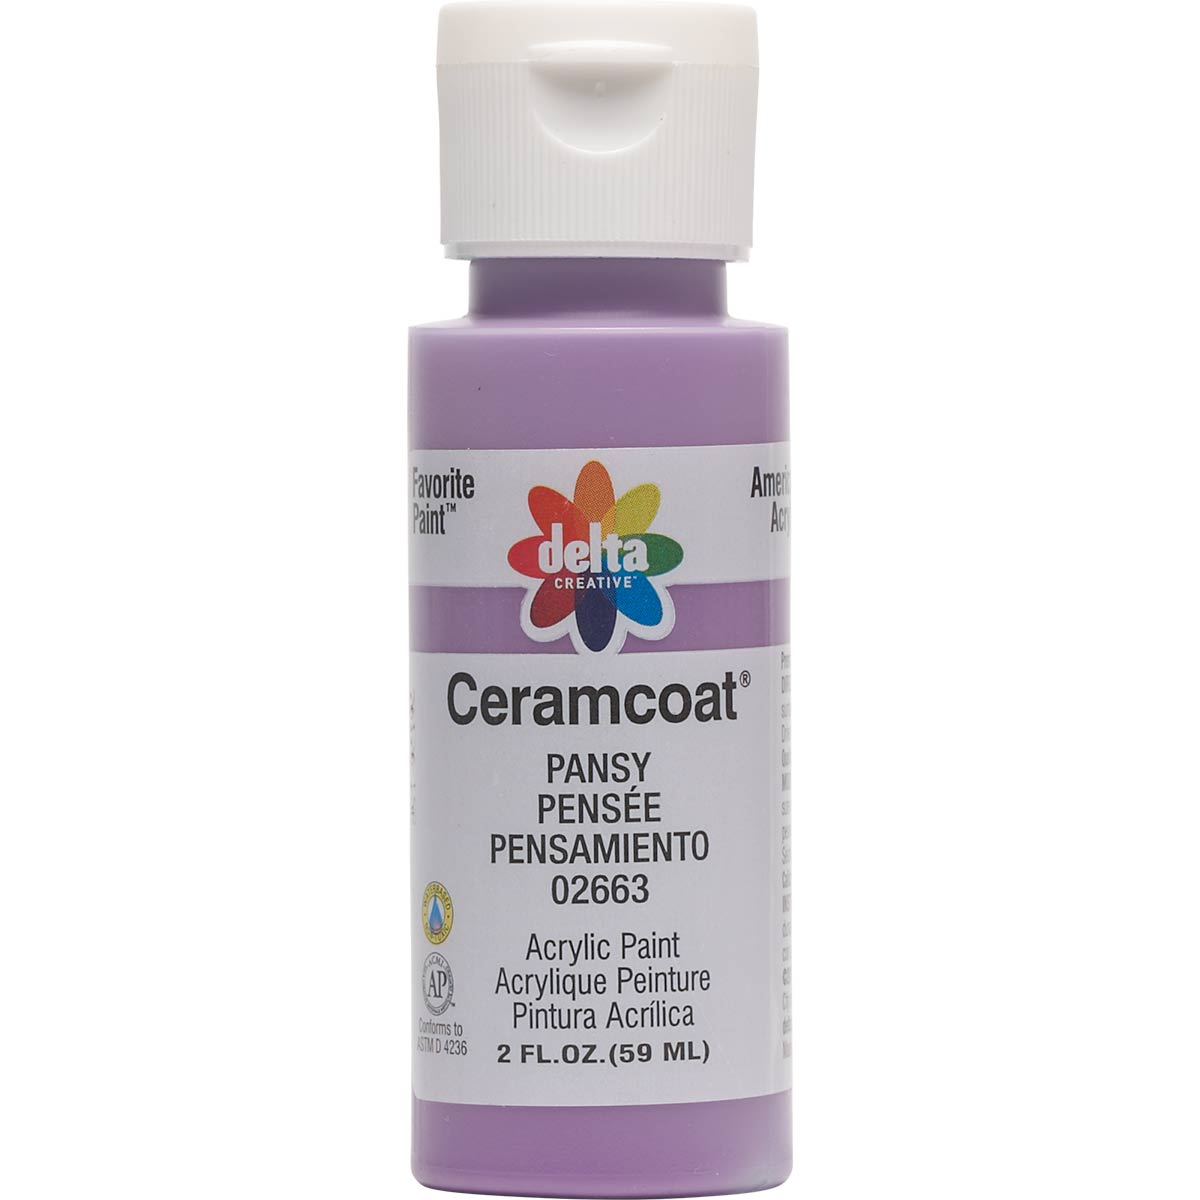 Delta Ceramcoat ® Acrylic Paint - Pansy, 2 oz. - 026630202W